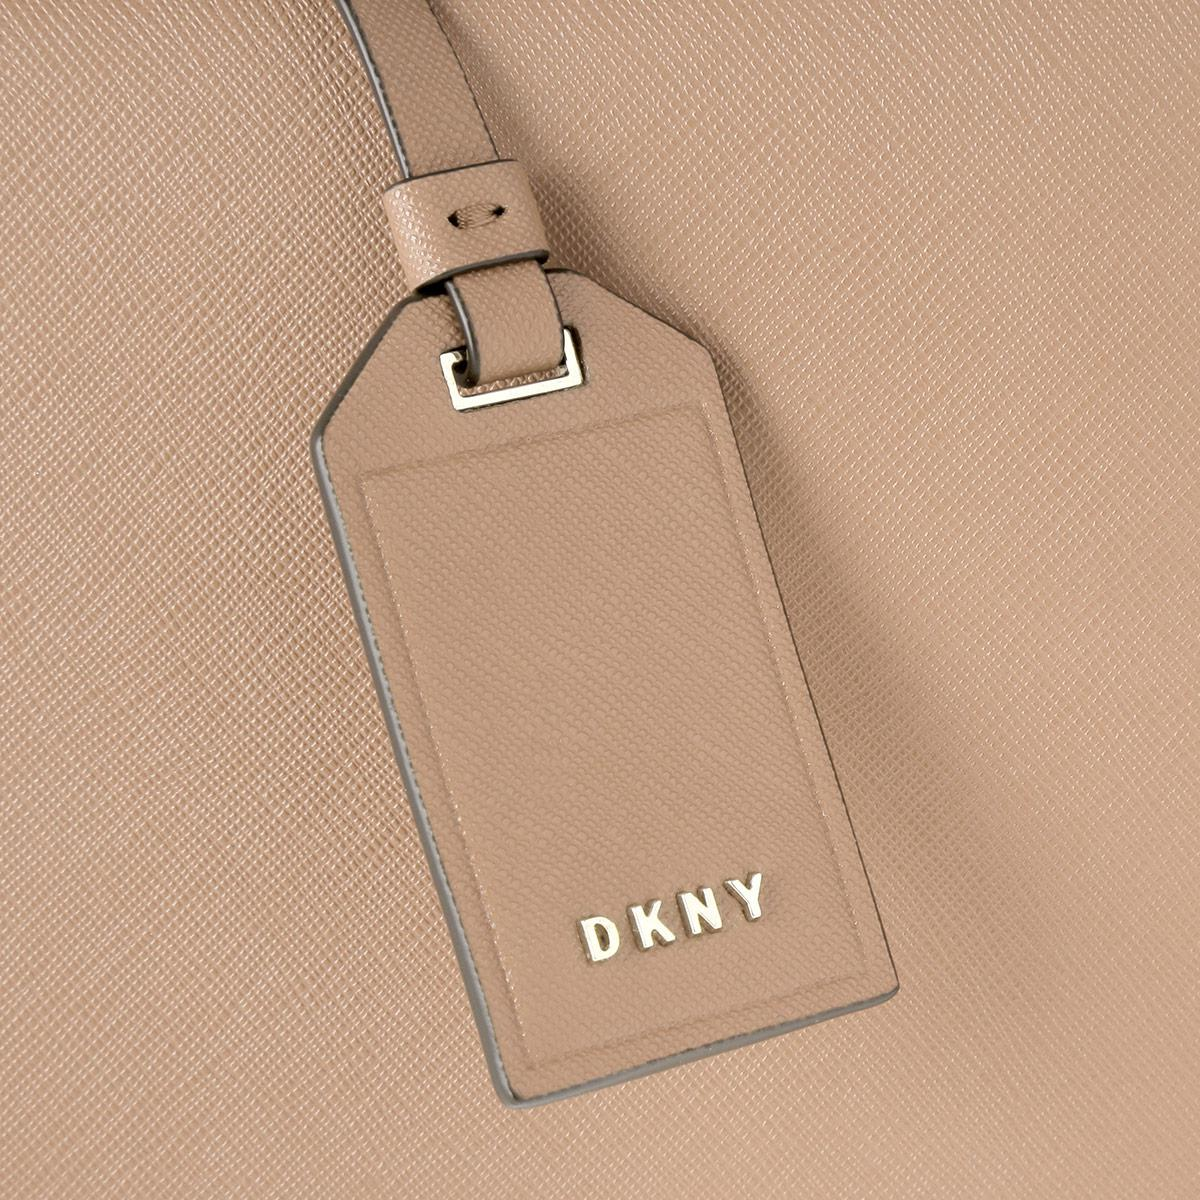 DKNY Leather Bryant Park Soft Saffiano Mini Tote Crossbody Tarp in Beige (Natural)